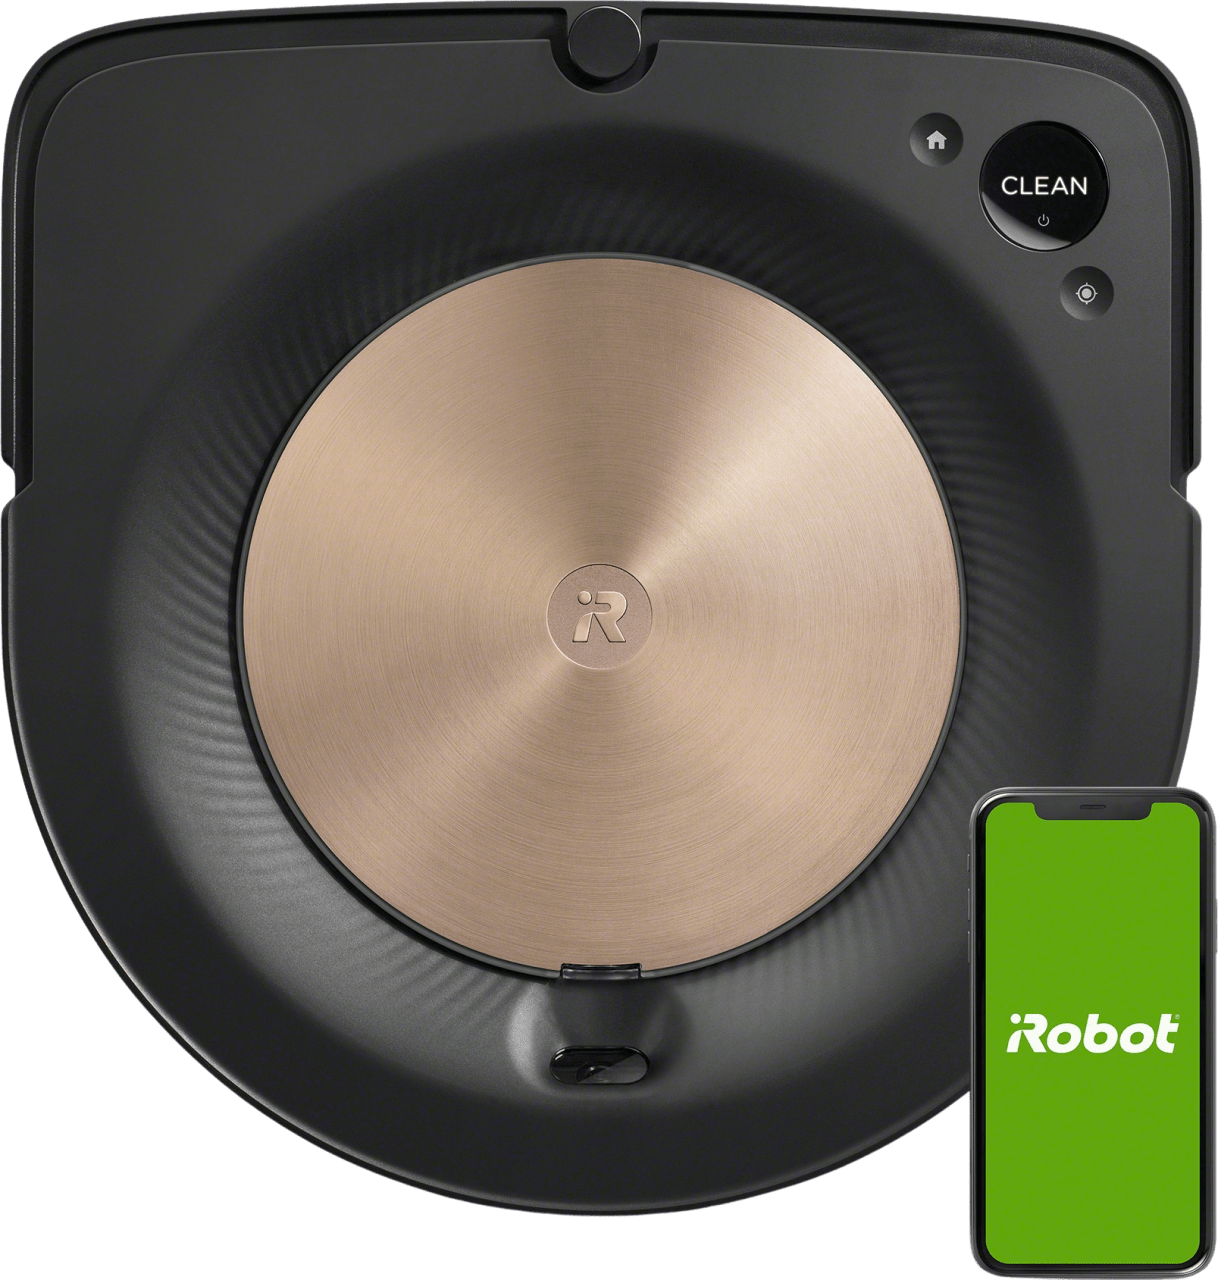 Black iRobot Roomba s9 Vacuum Cleaner Robot.1